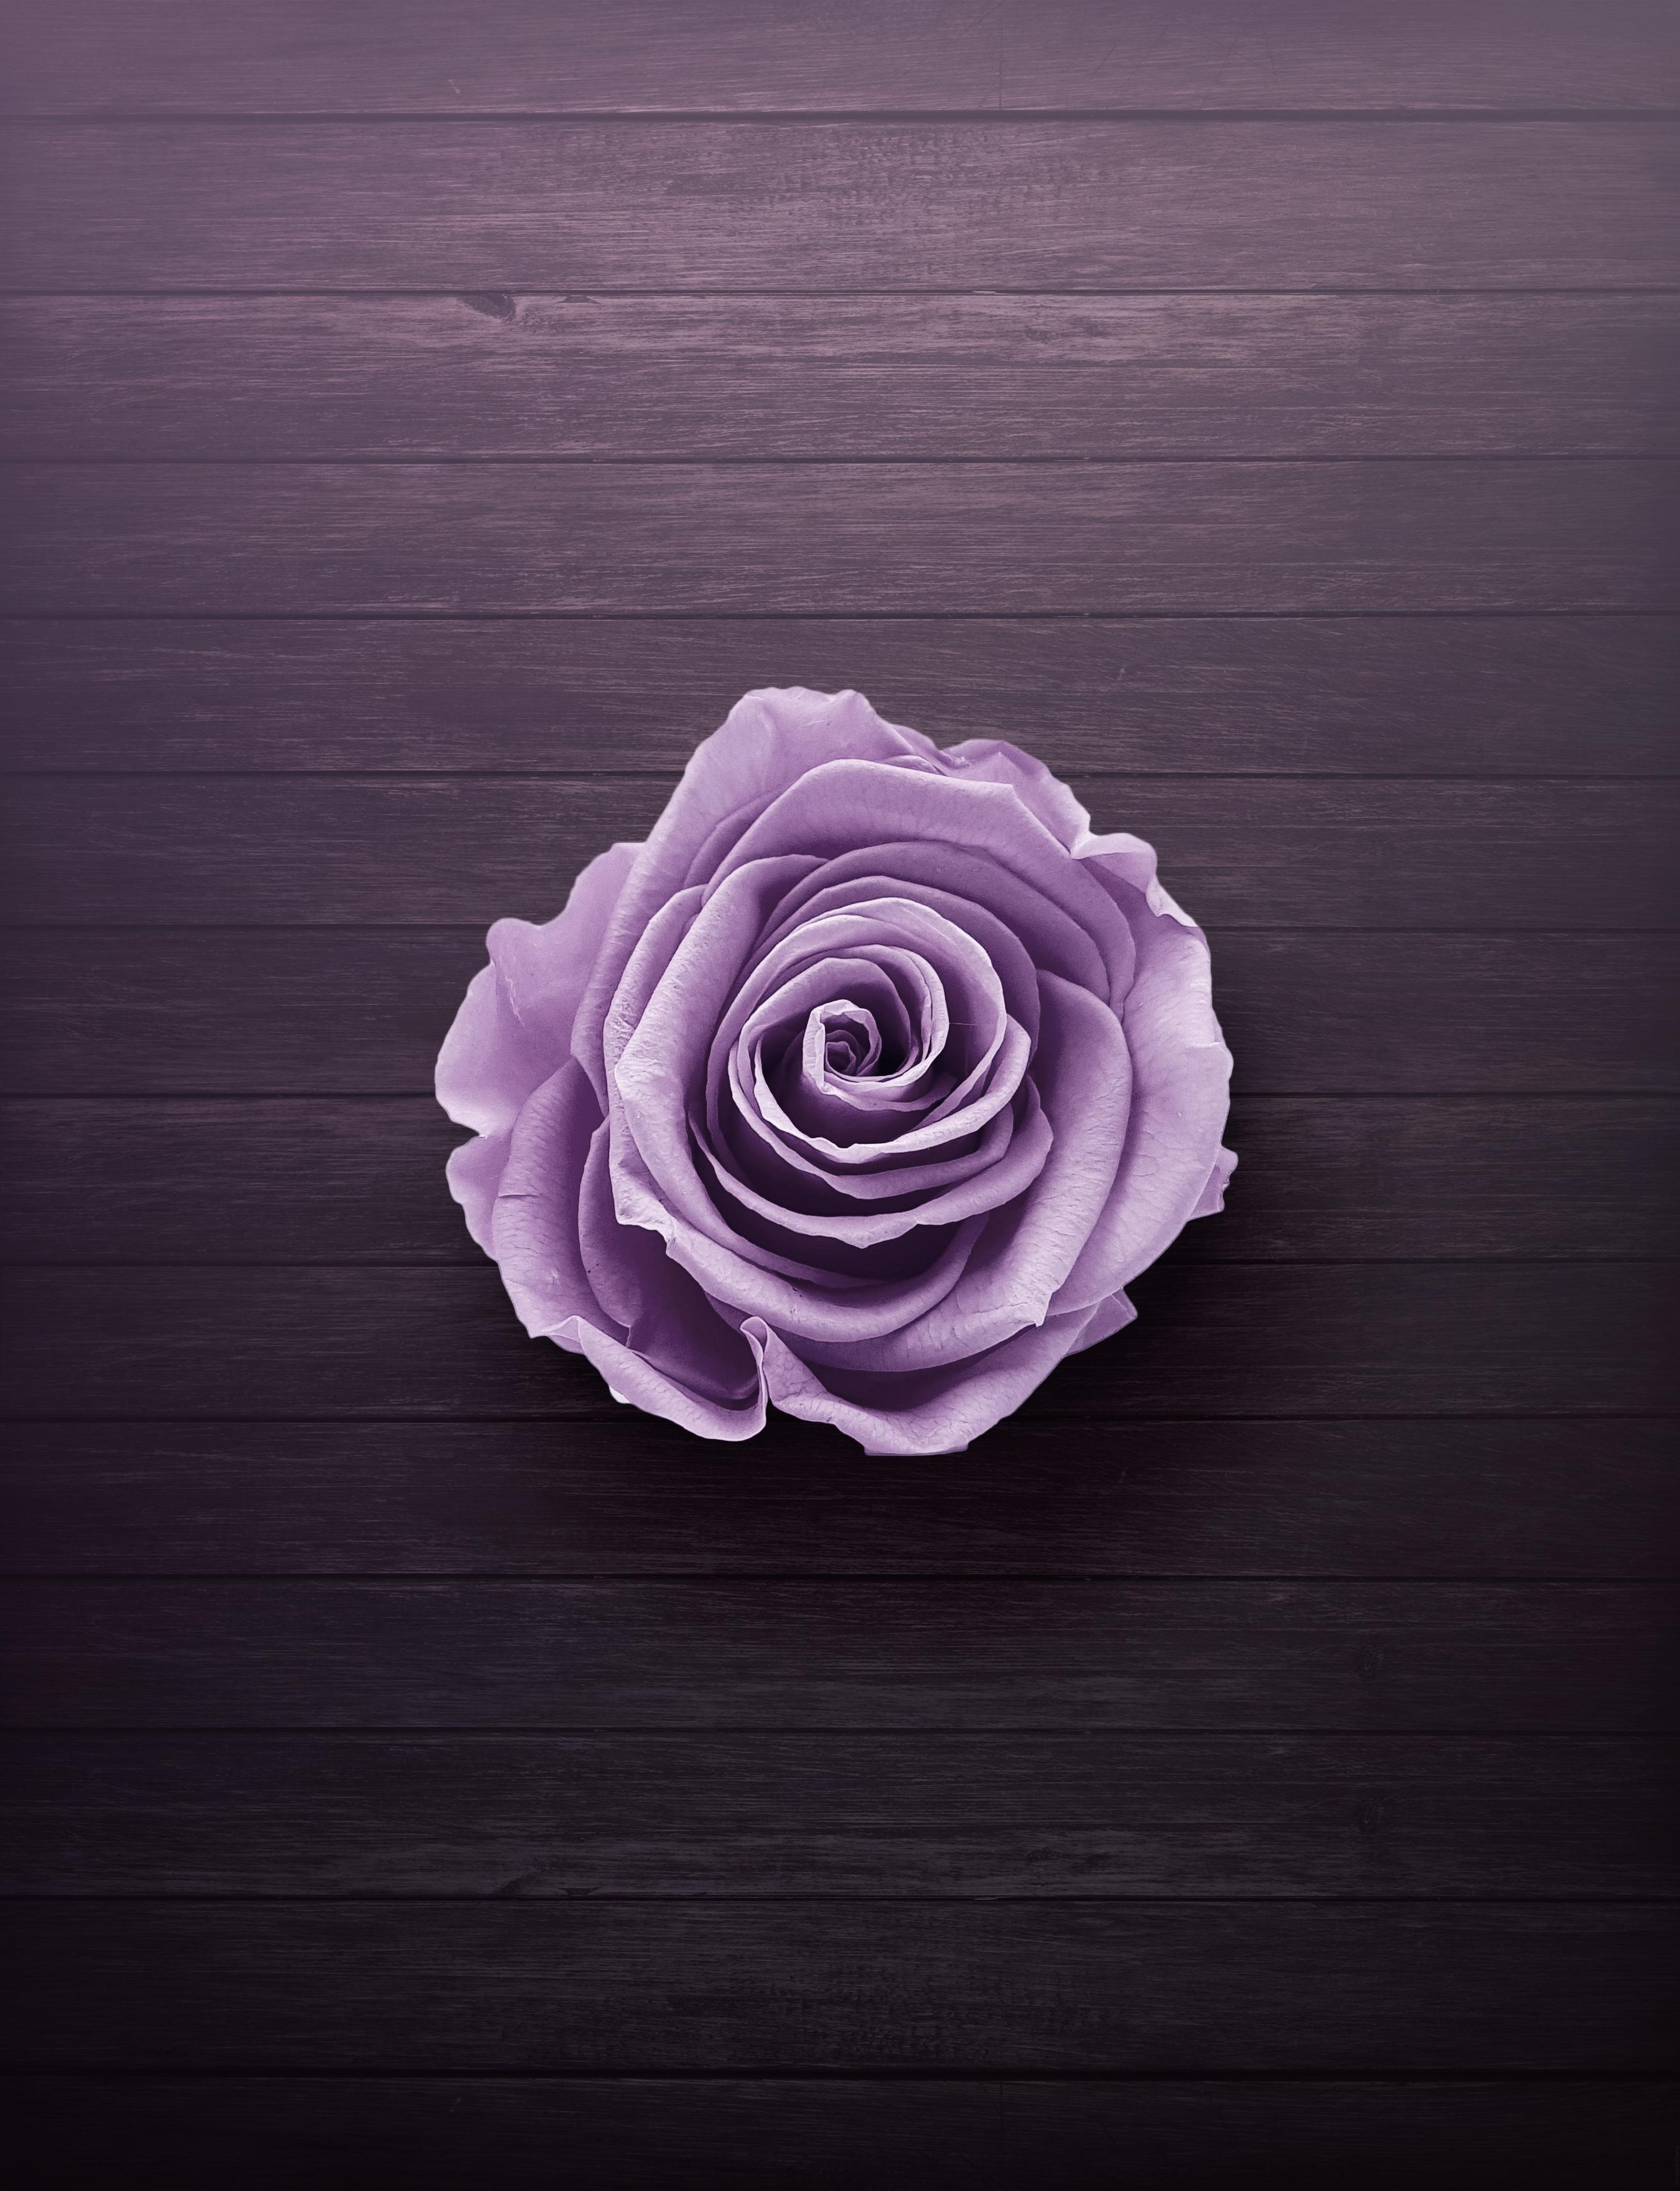 Macrophotography of Purple Petal Flower 183 Free Stock Photo